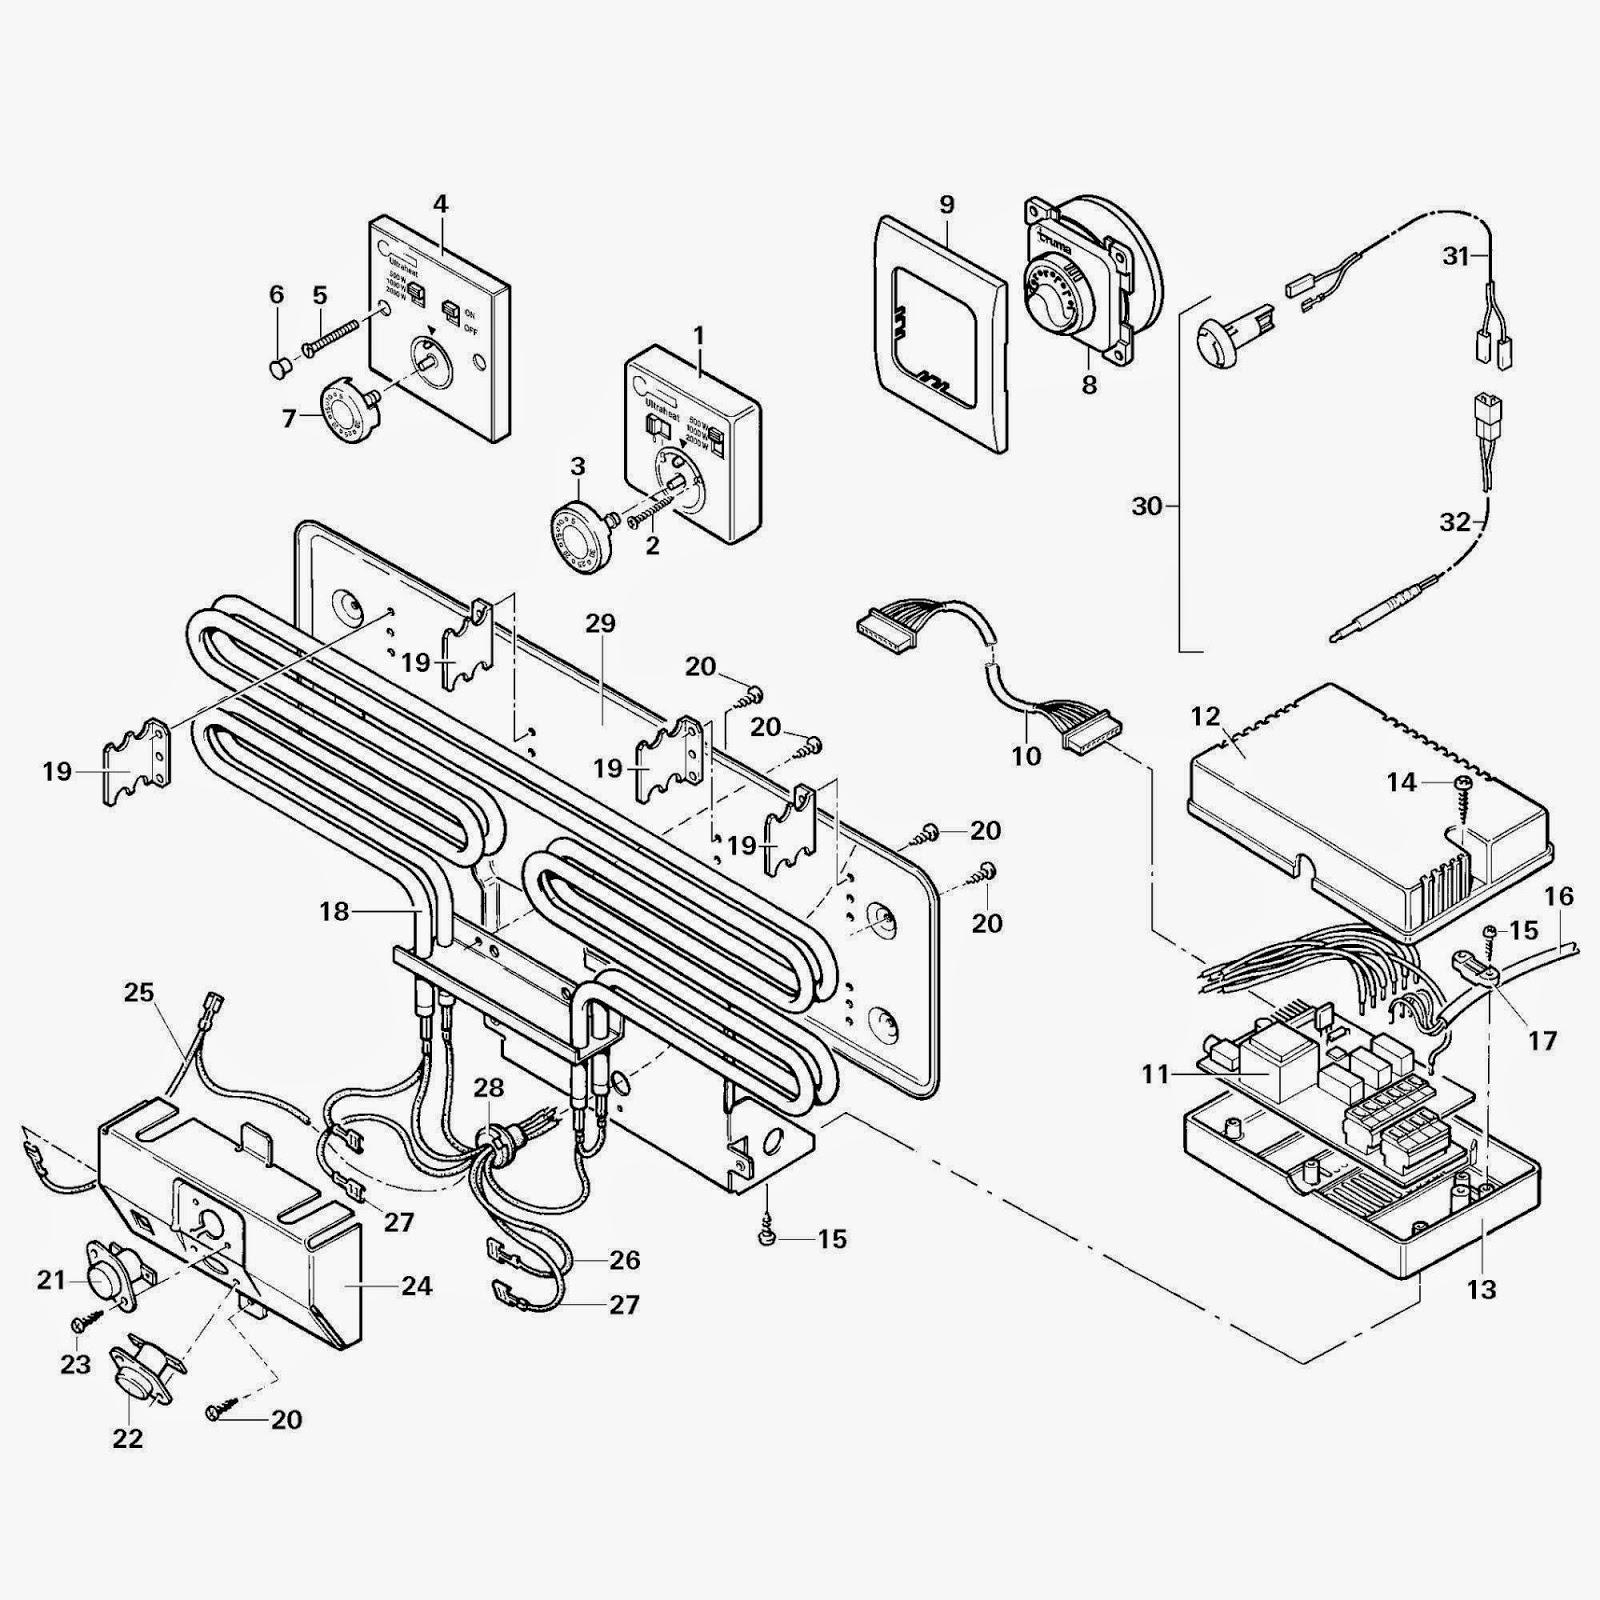 2009 kenworth t800 wiring diagram kenworth wiring diagram on kenworth pdf images electrical engine